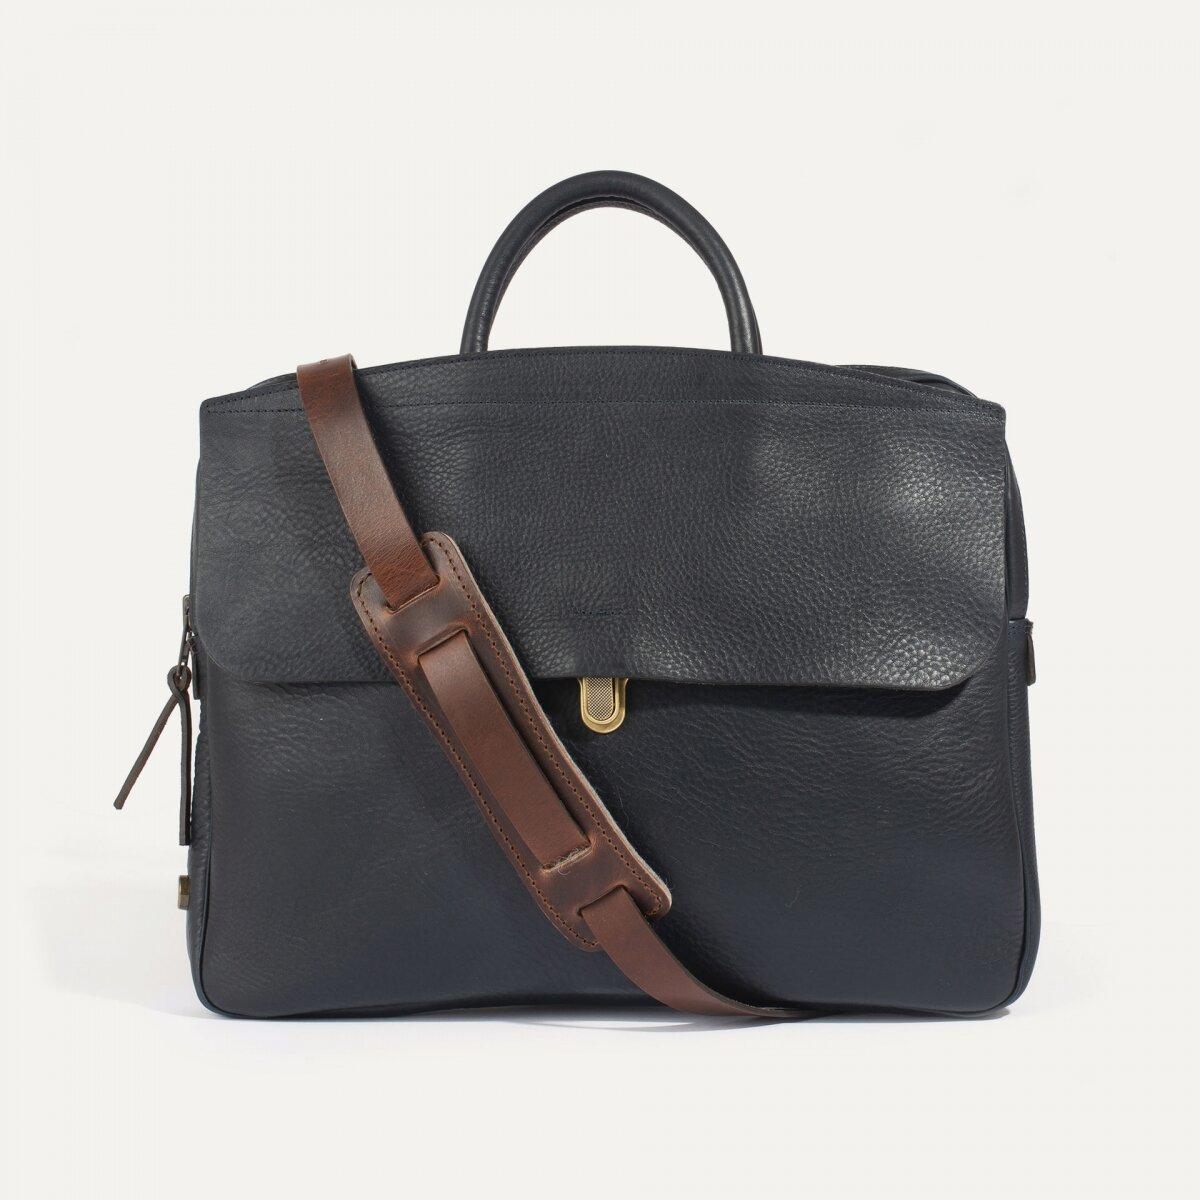 Bleu De Chauffe Leather Bags Calame Palma